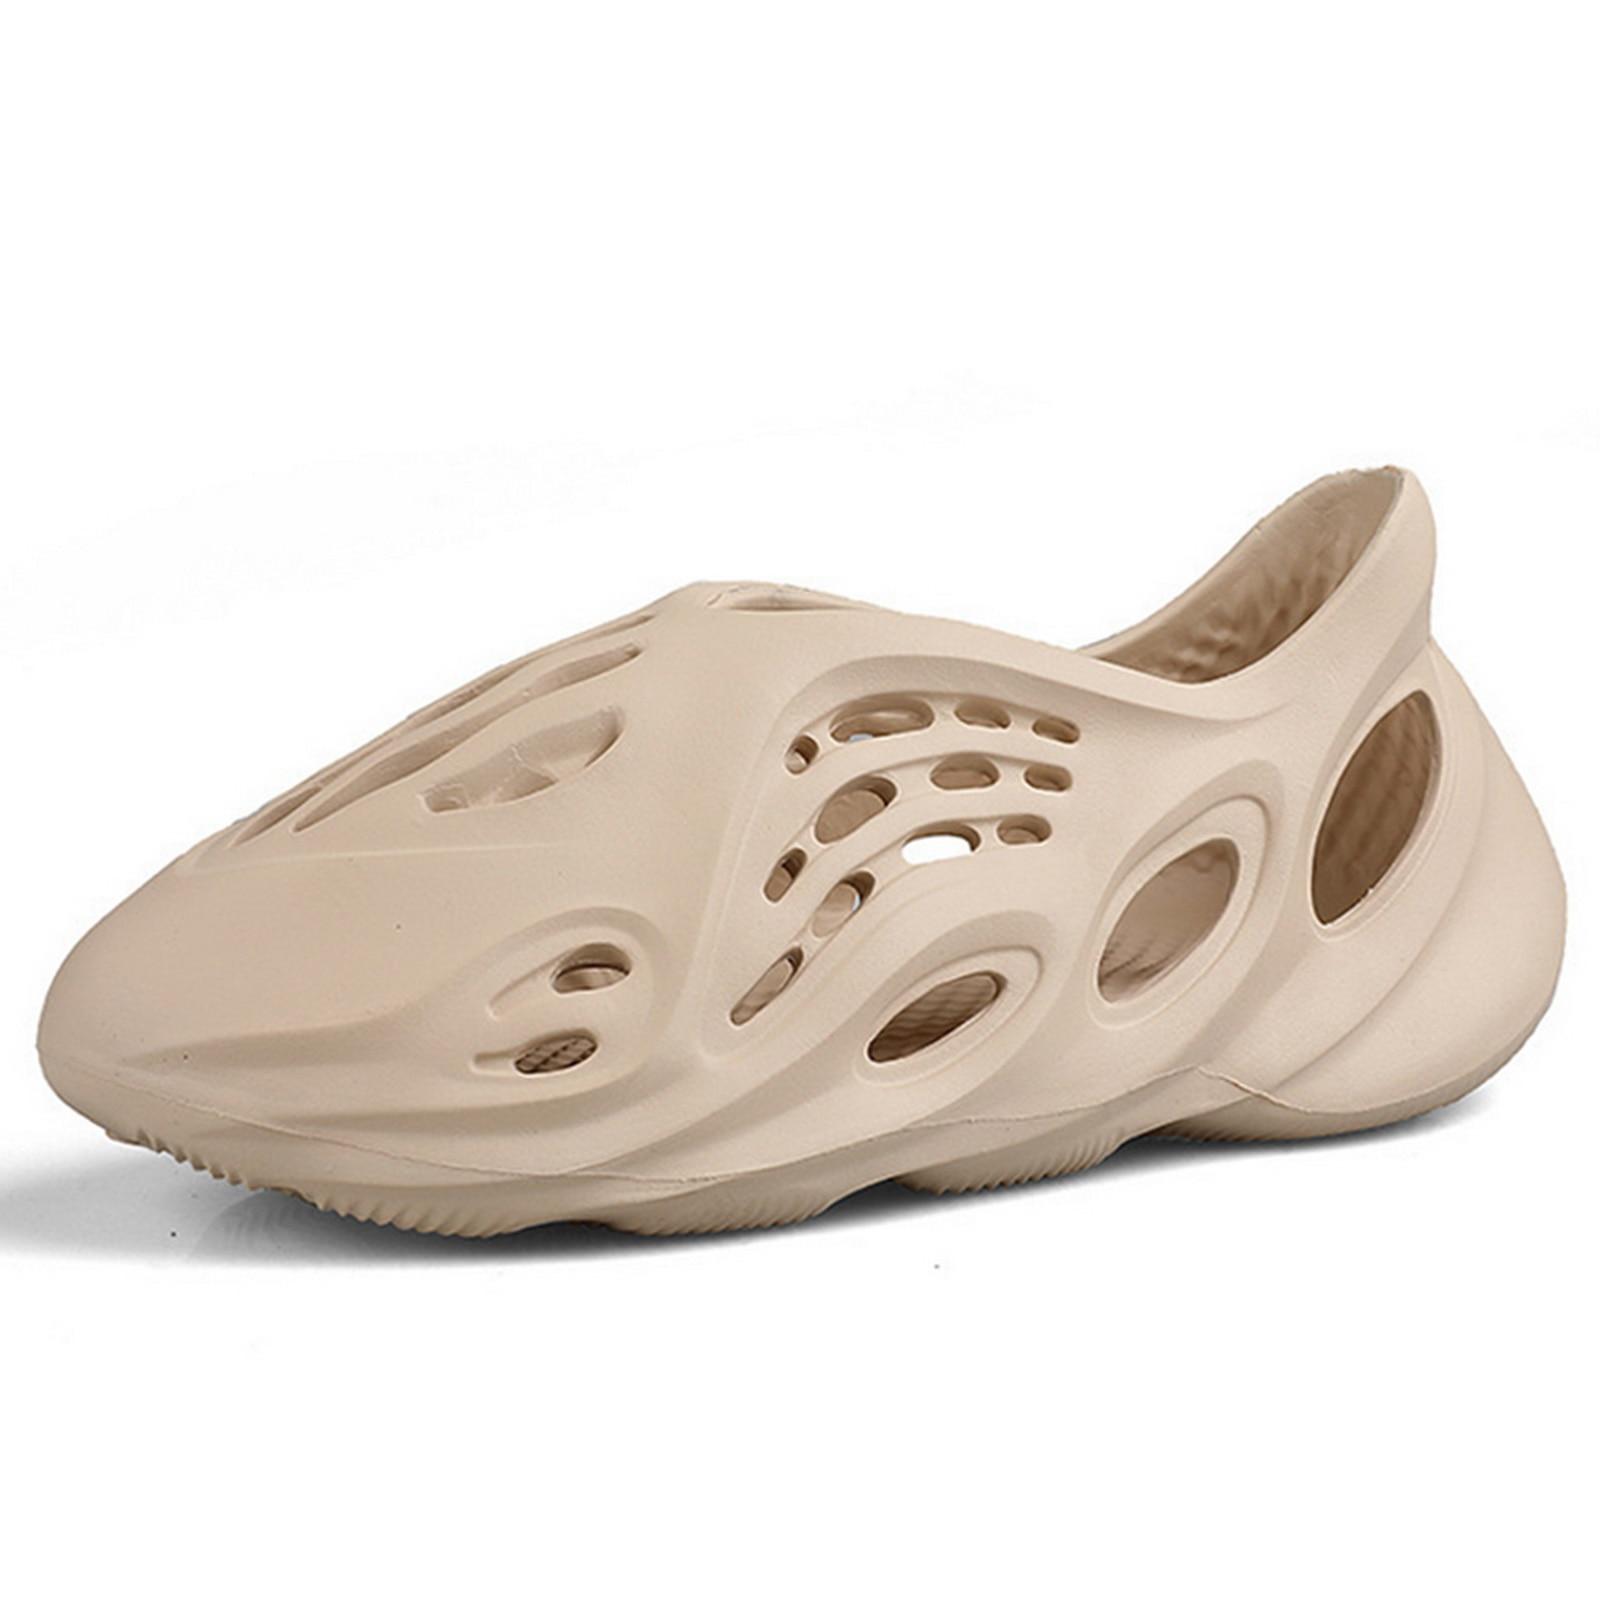 Summer Casual Shoes Men Sandals Soft Mesh Couple Beach Slippers Men Swimming Sandal Foam Runners Comfort Flip-flops Slipper